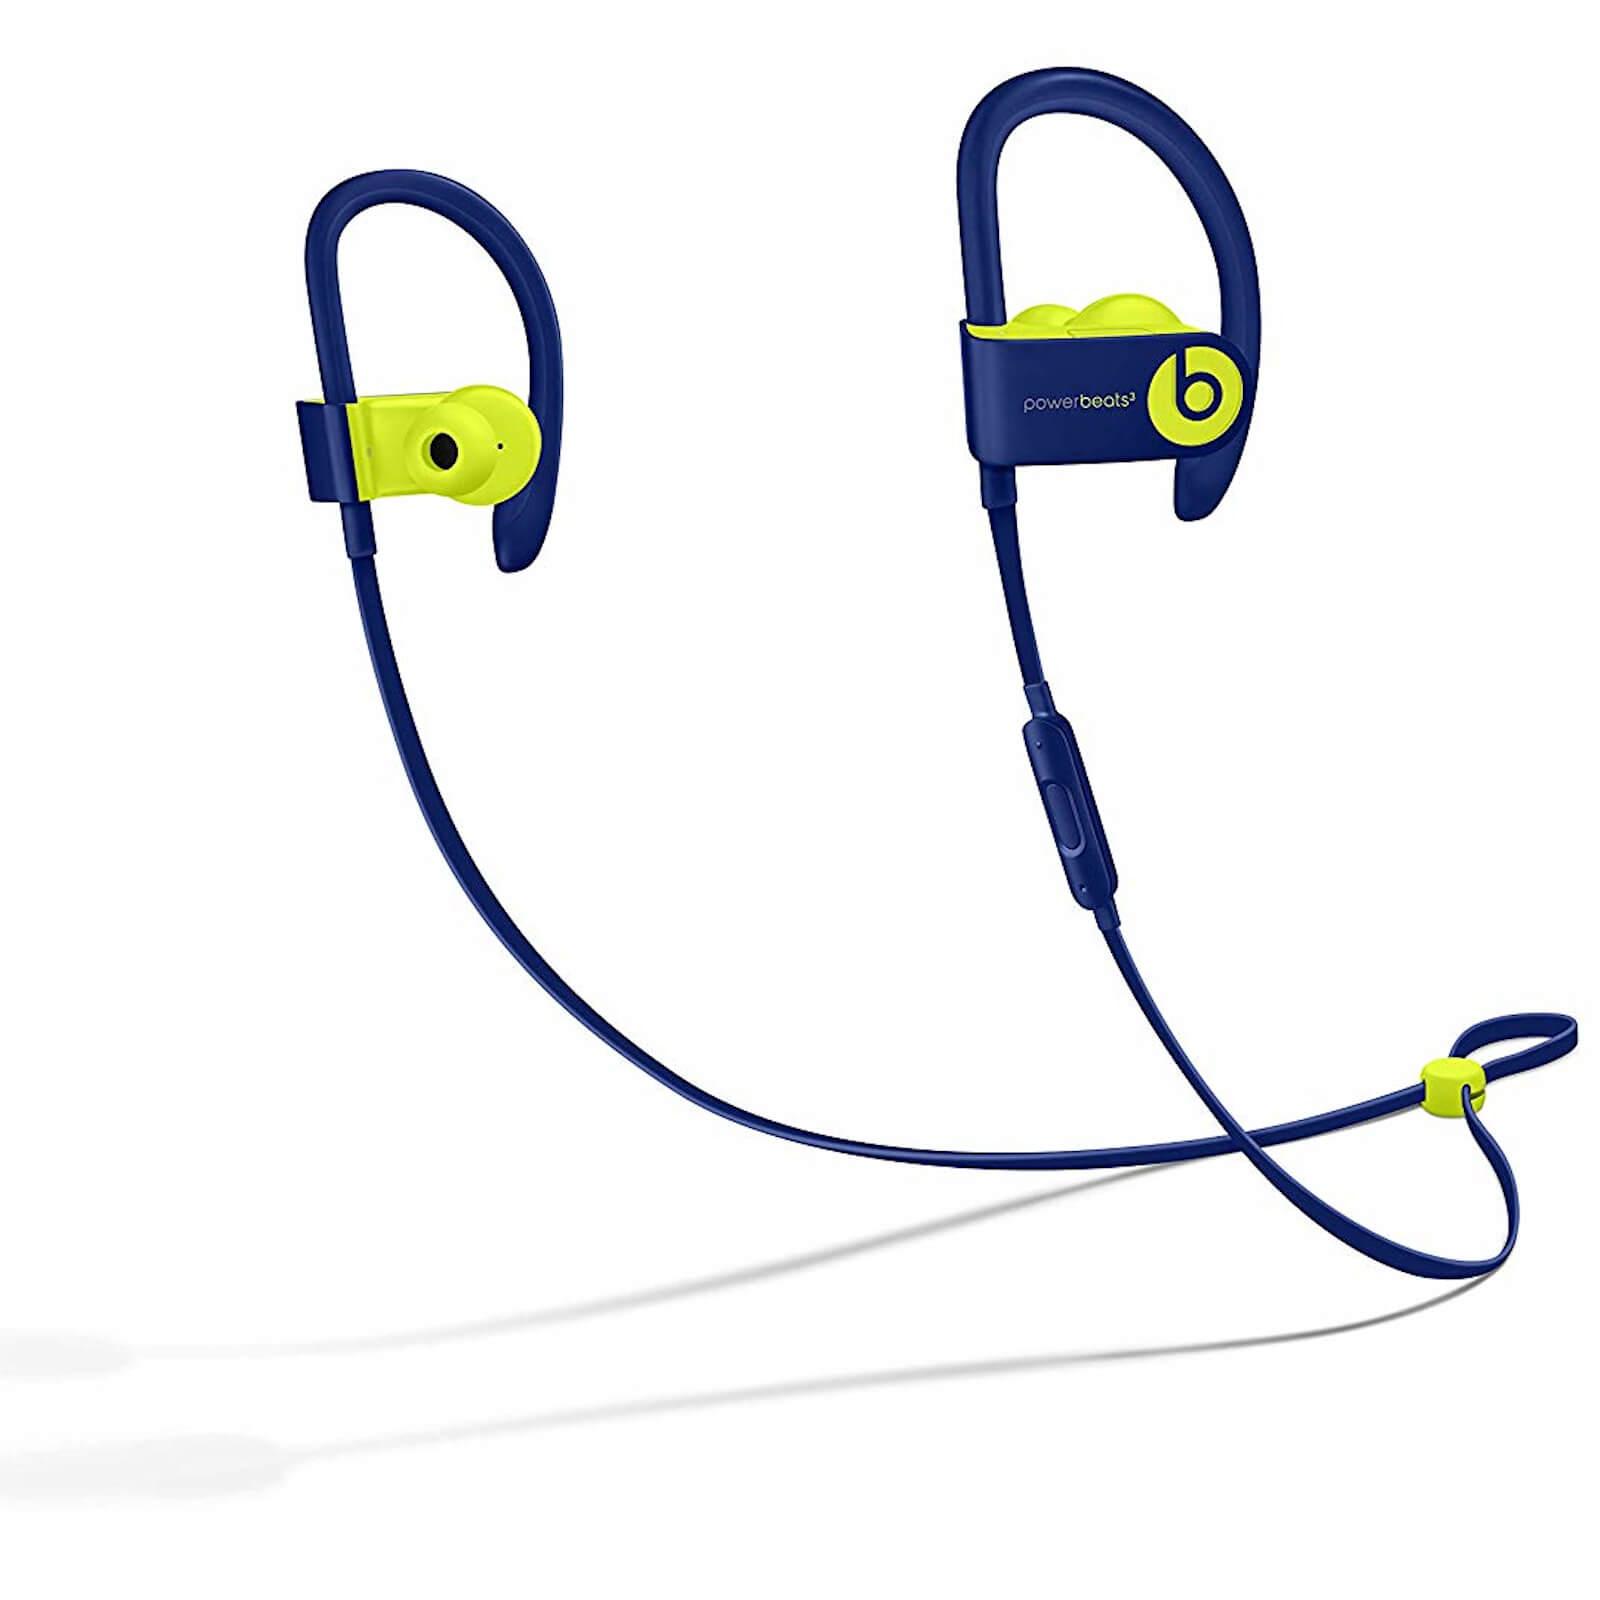 BEATS BY DR. DRE POWERBEATS 3 WIRELESS IN-EAR HEADPHONES POP COLLECTION - INDIGO - £74.99 @ IWOOT